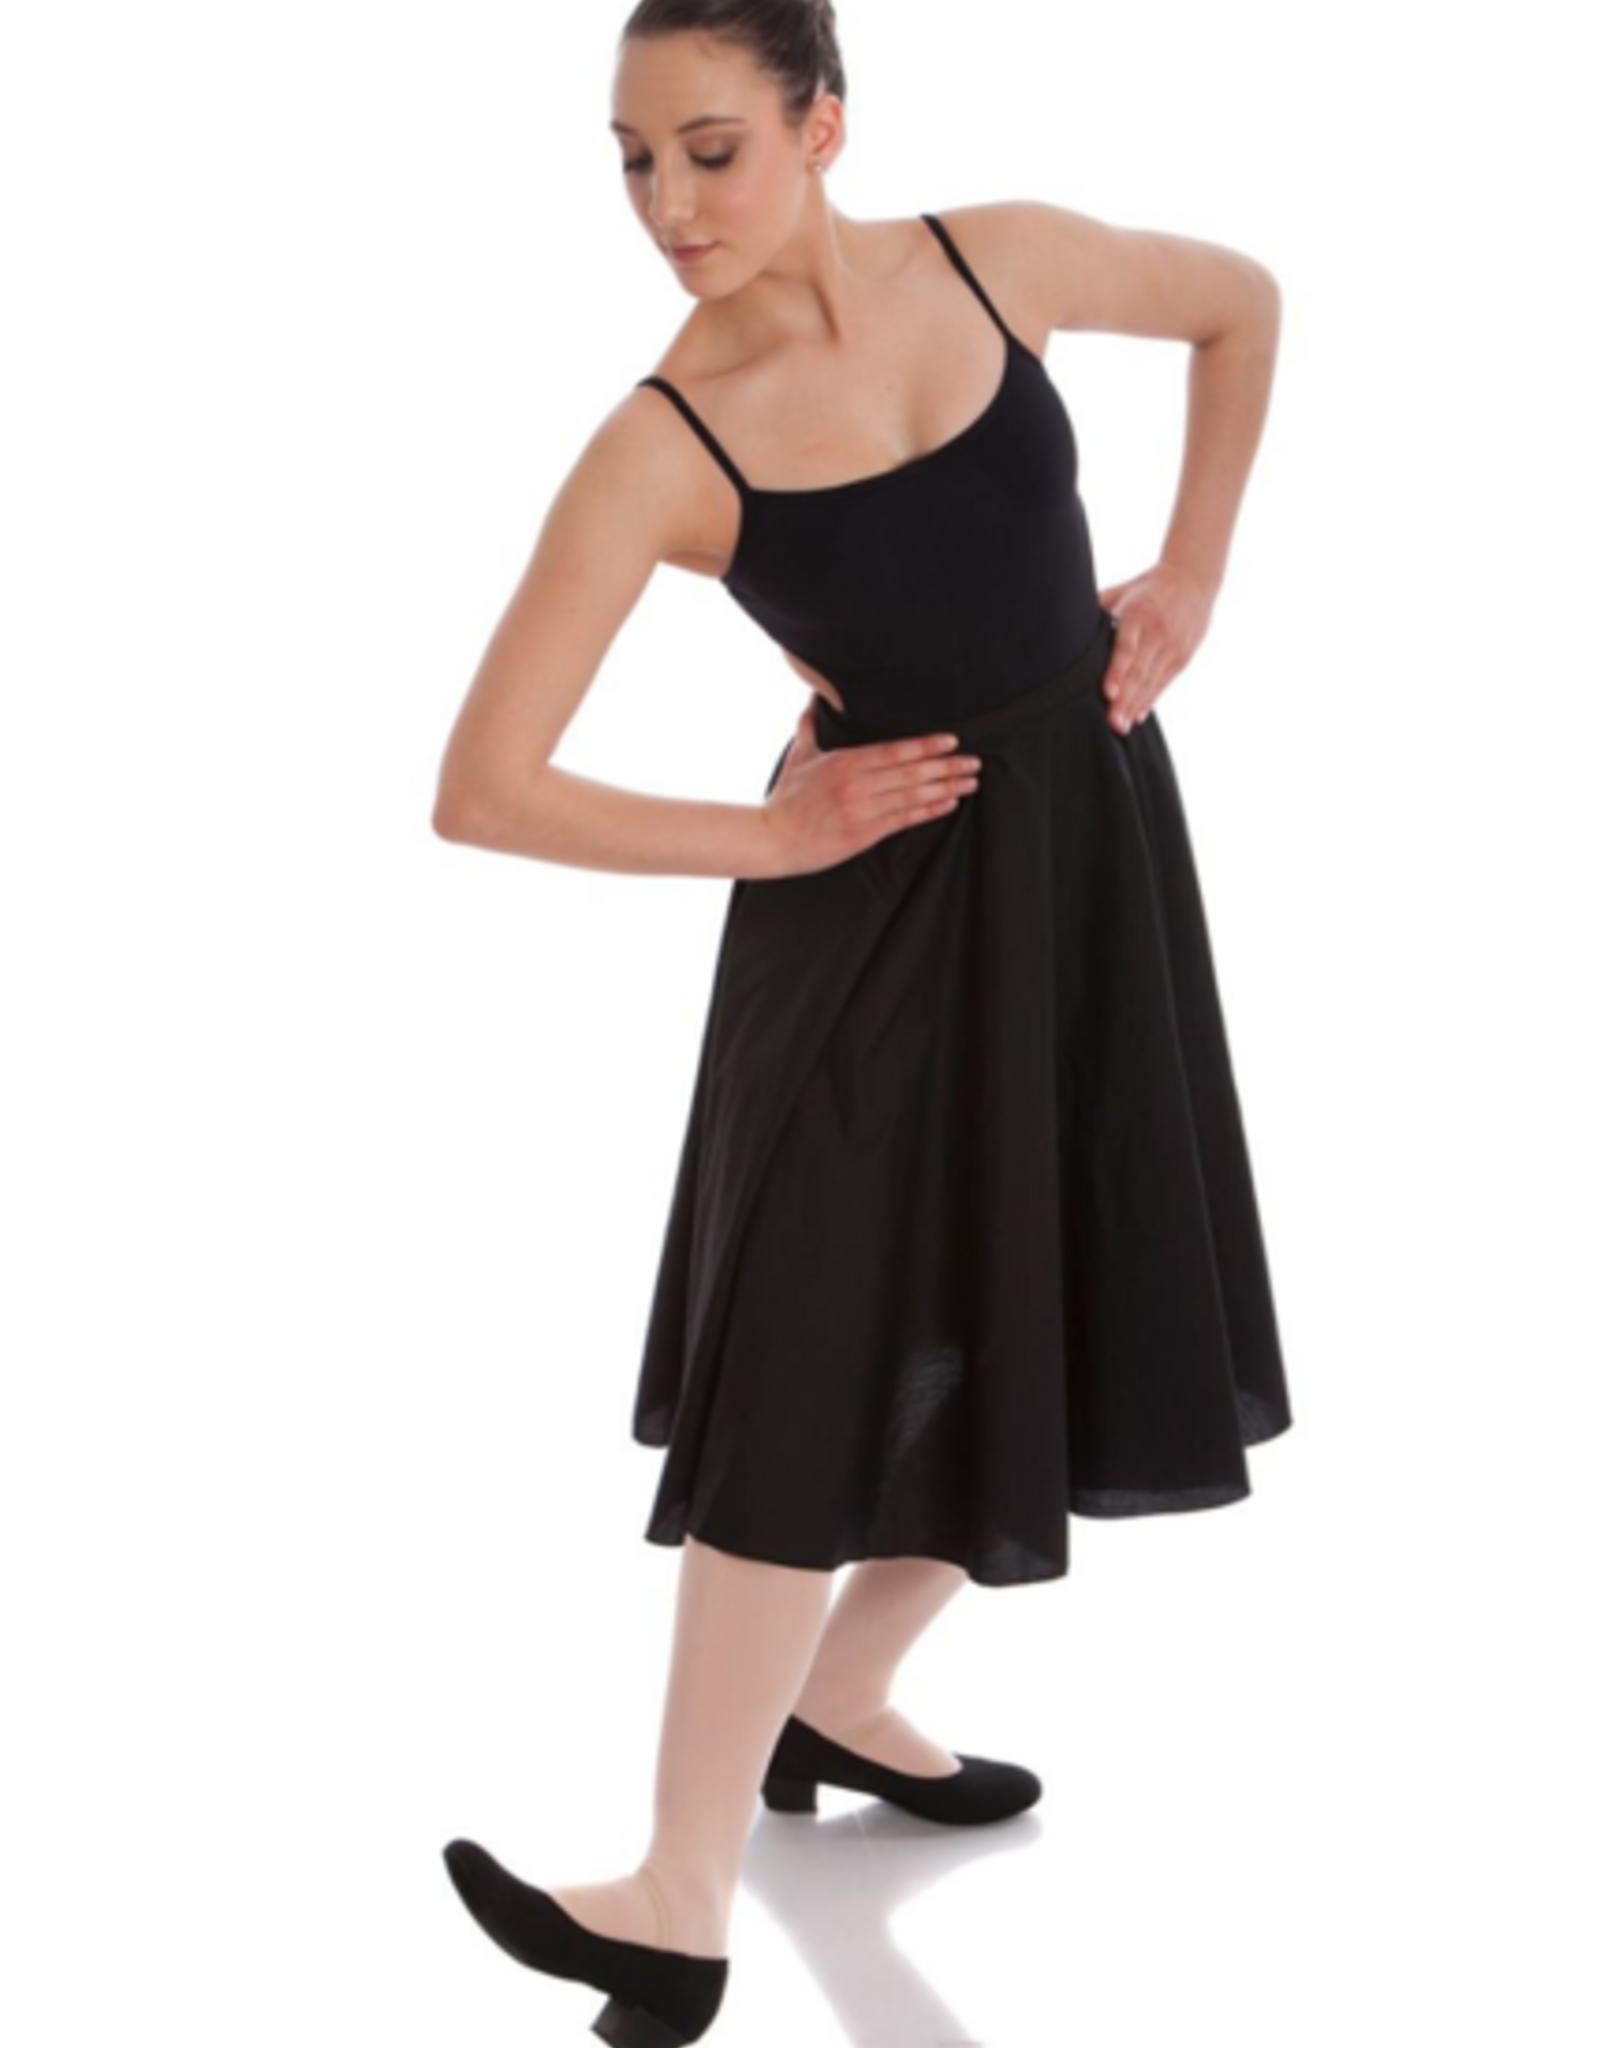 Energetiks Matilda  Character Skirt